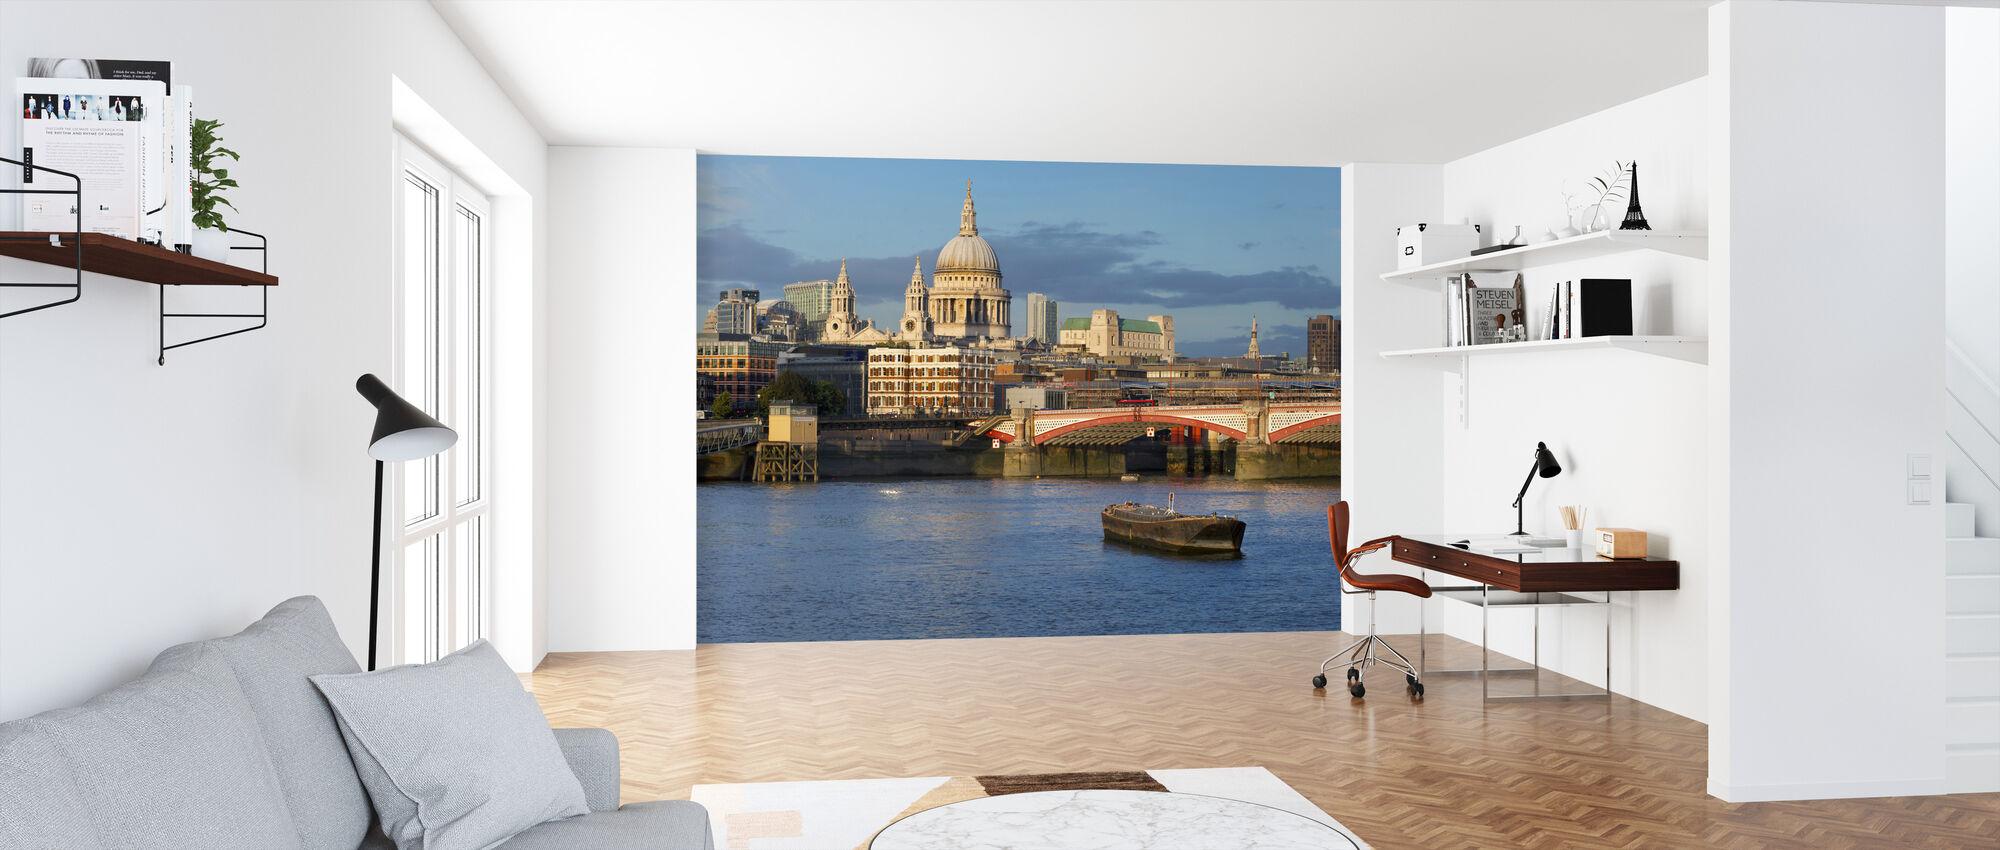 City of London Panorama - Wallpaper - Office